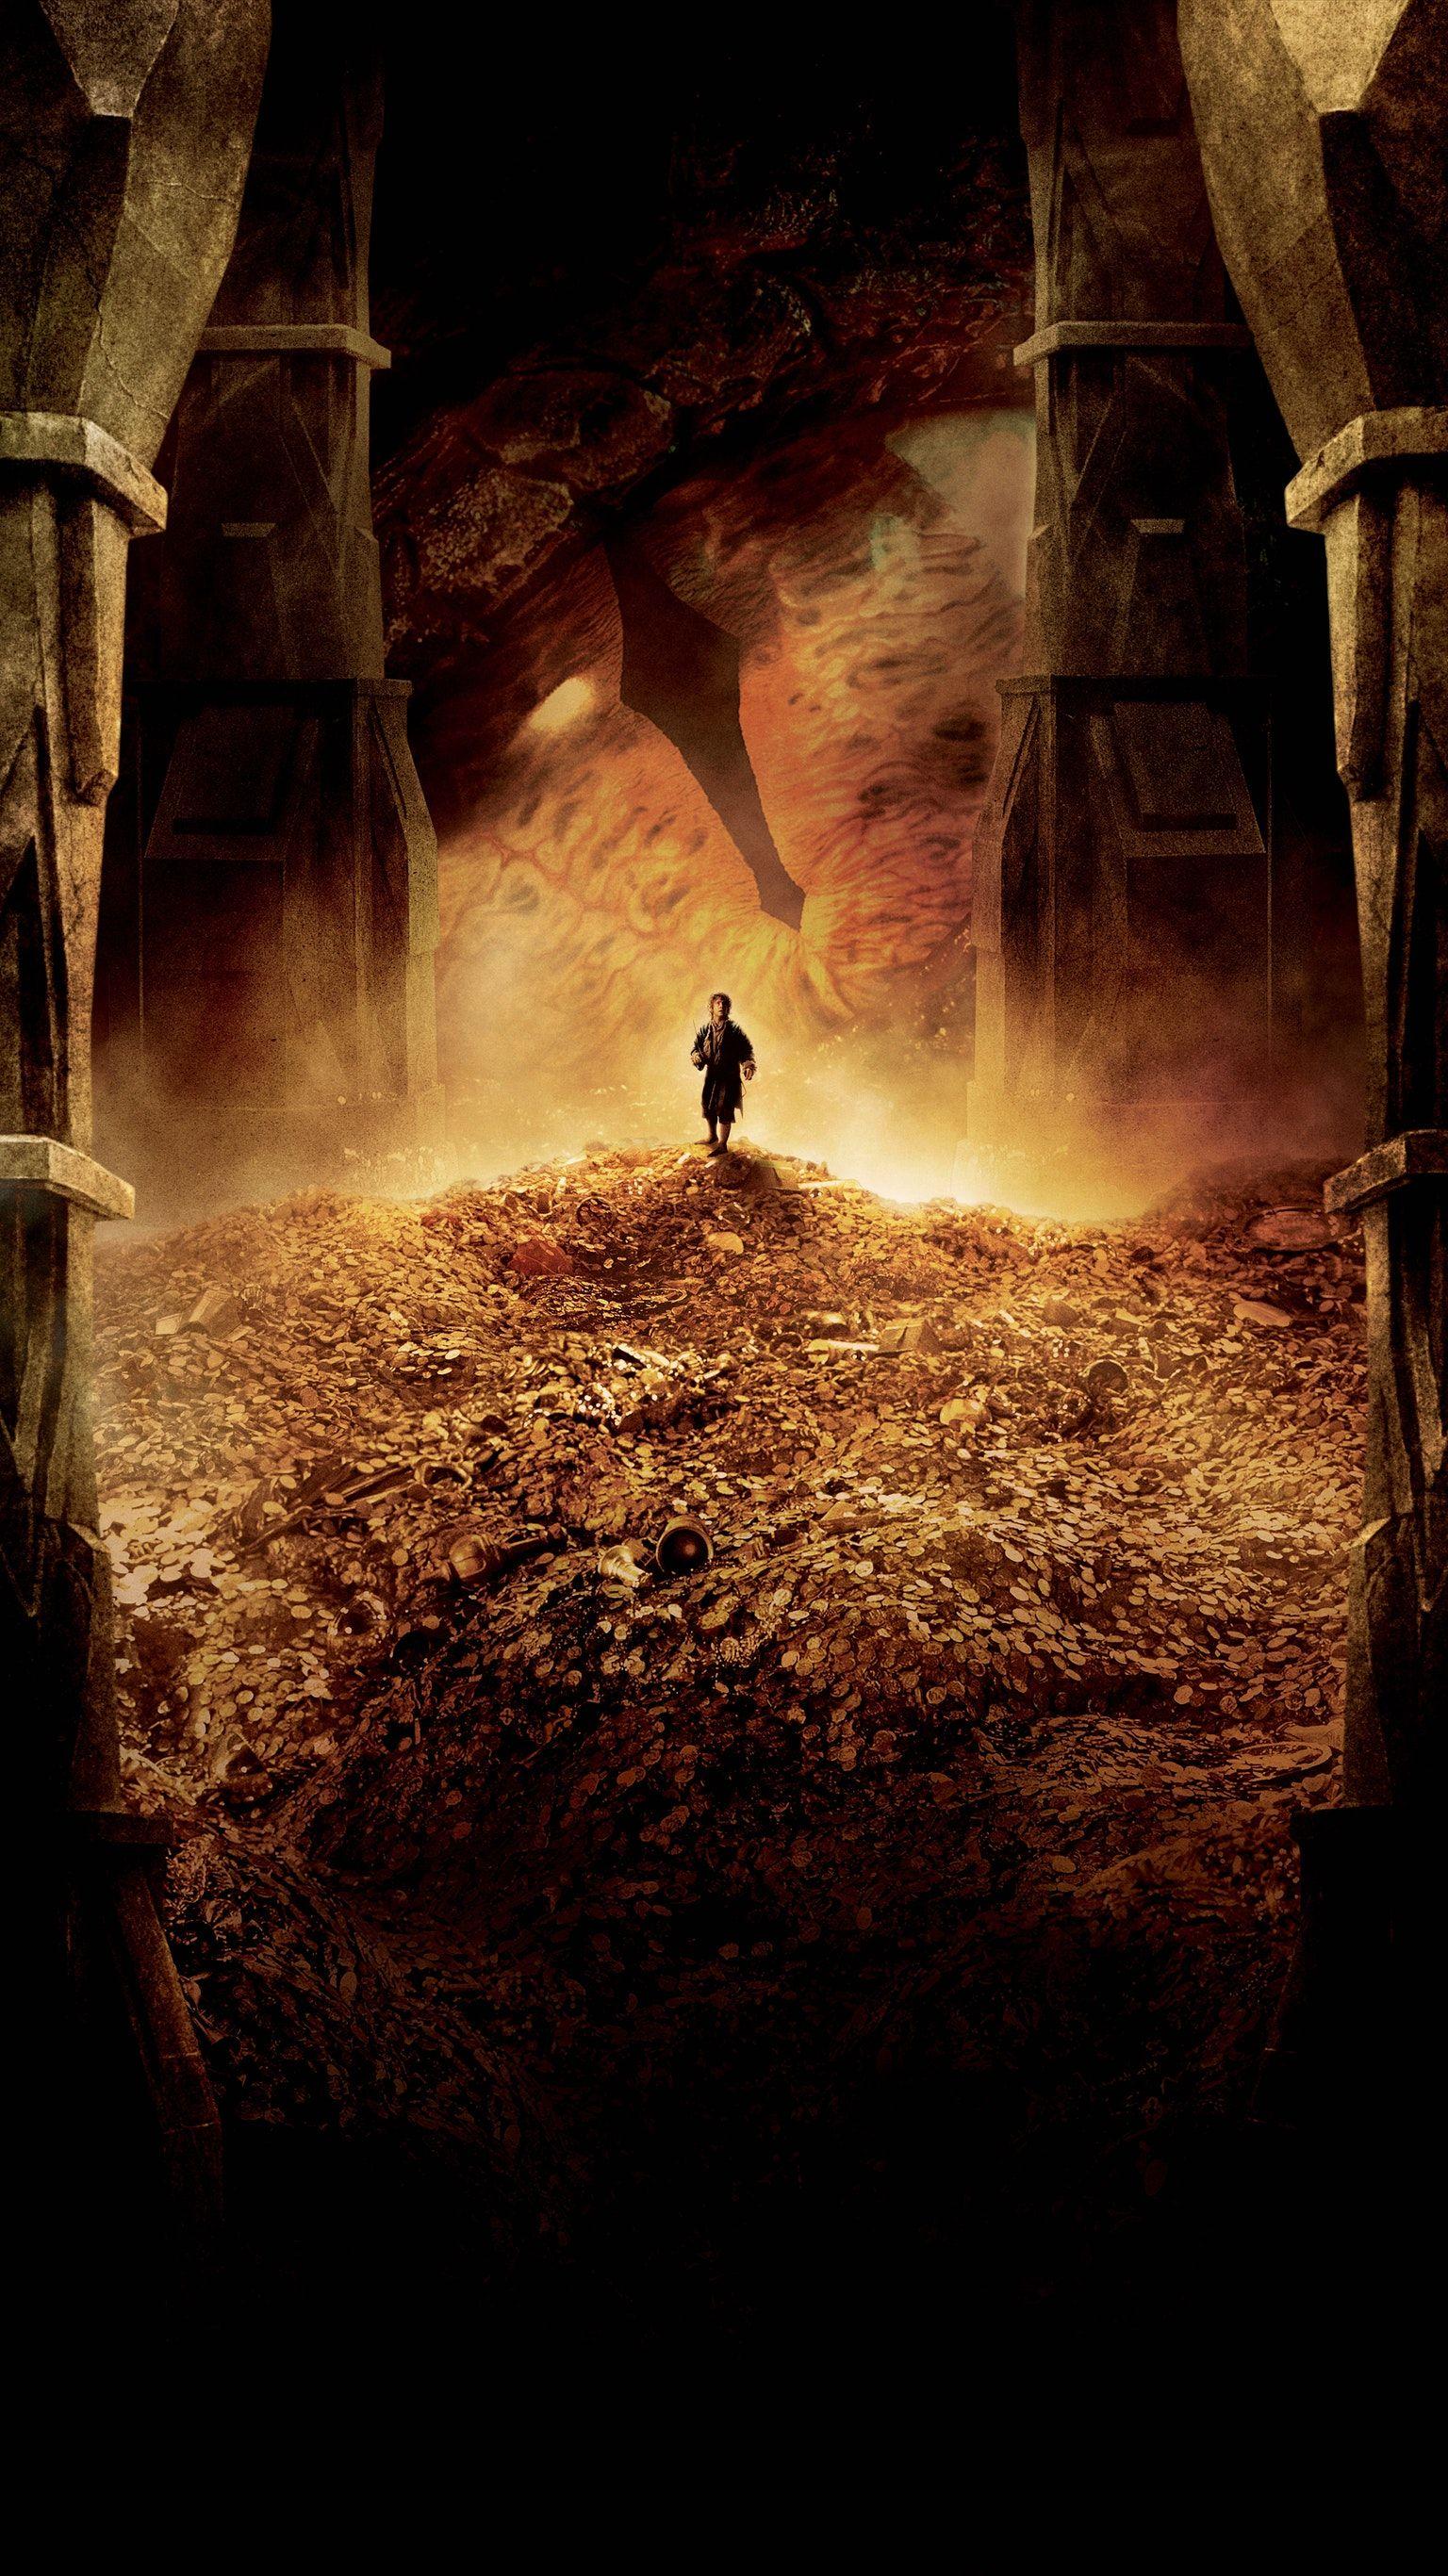 Desolation Hobbit of smaug iphone wallpaper